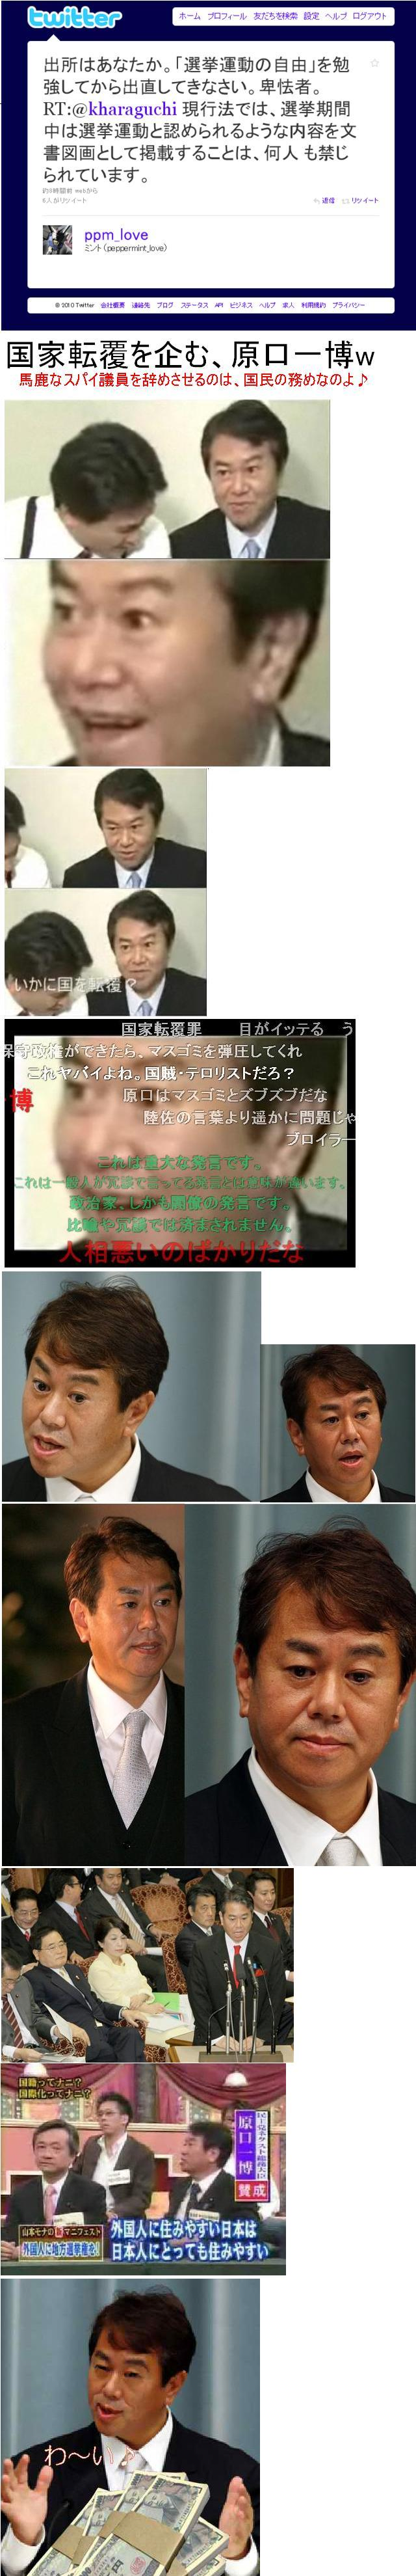 haraguchichonkousakywwww1.jpg